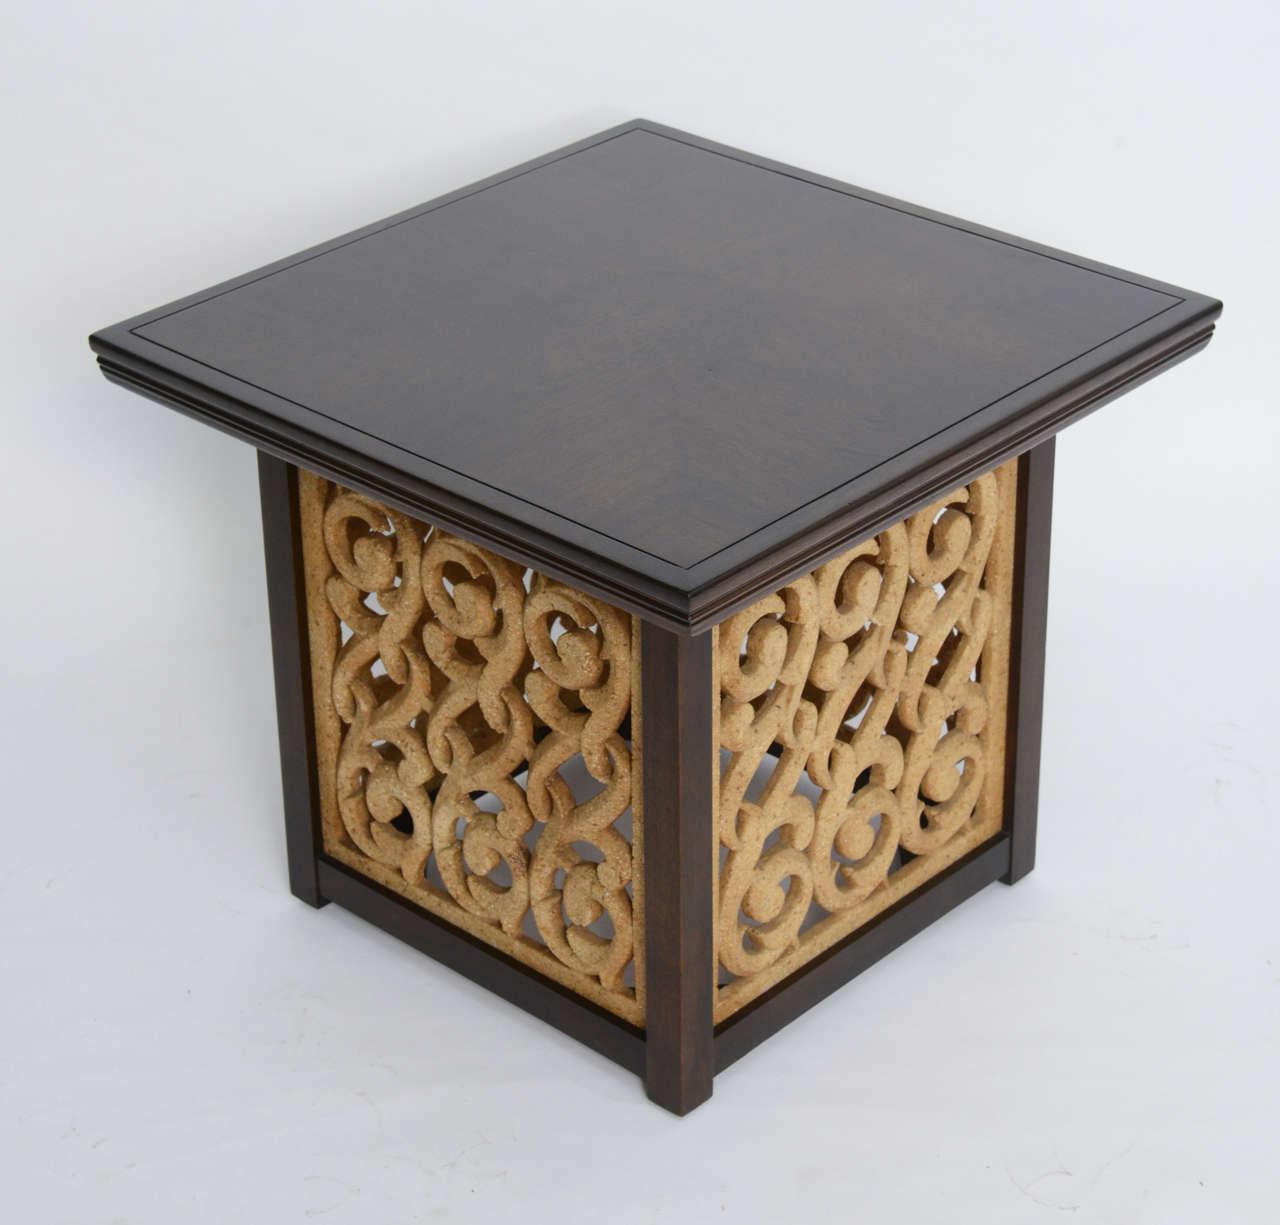 American Elegant 1950s Detailed Widdicomb Side Table in Walnut For Sale